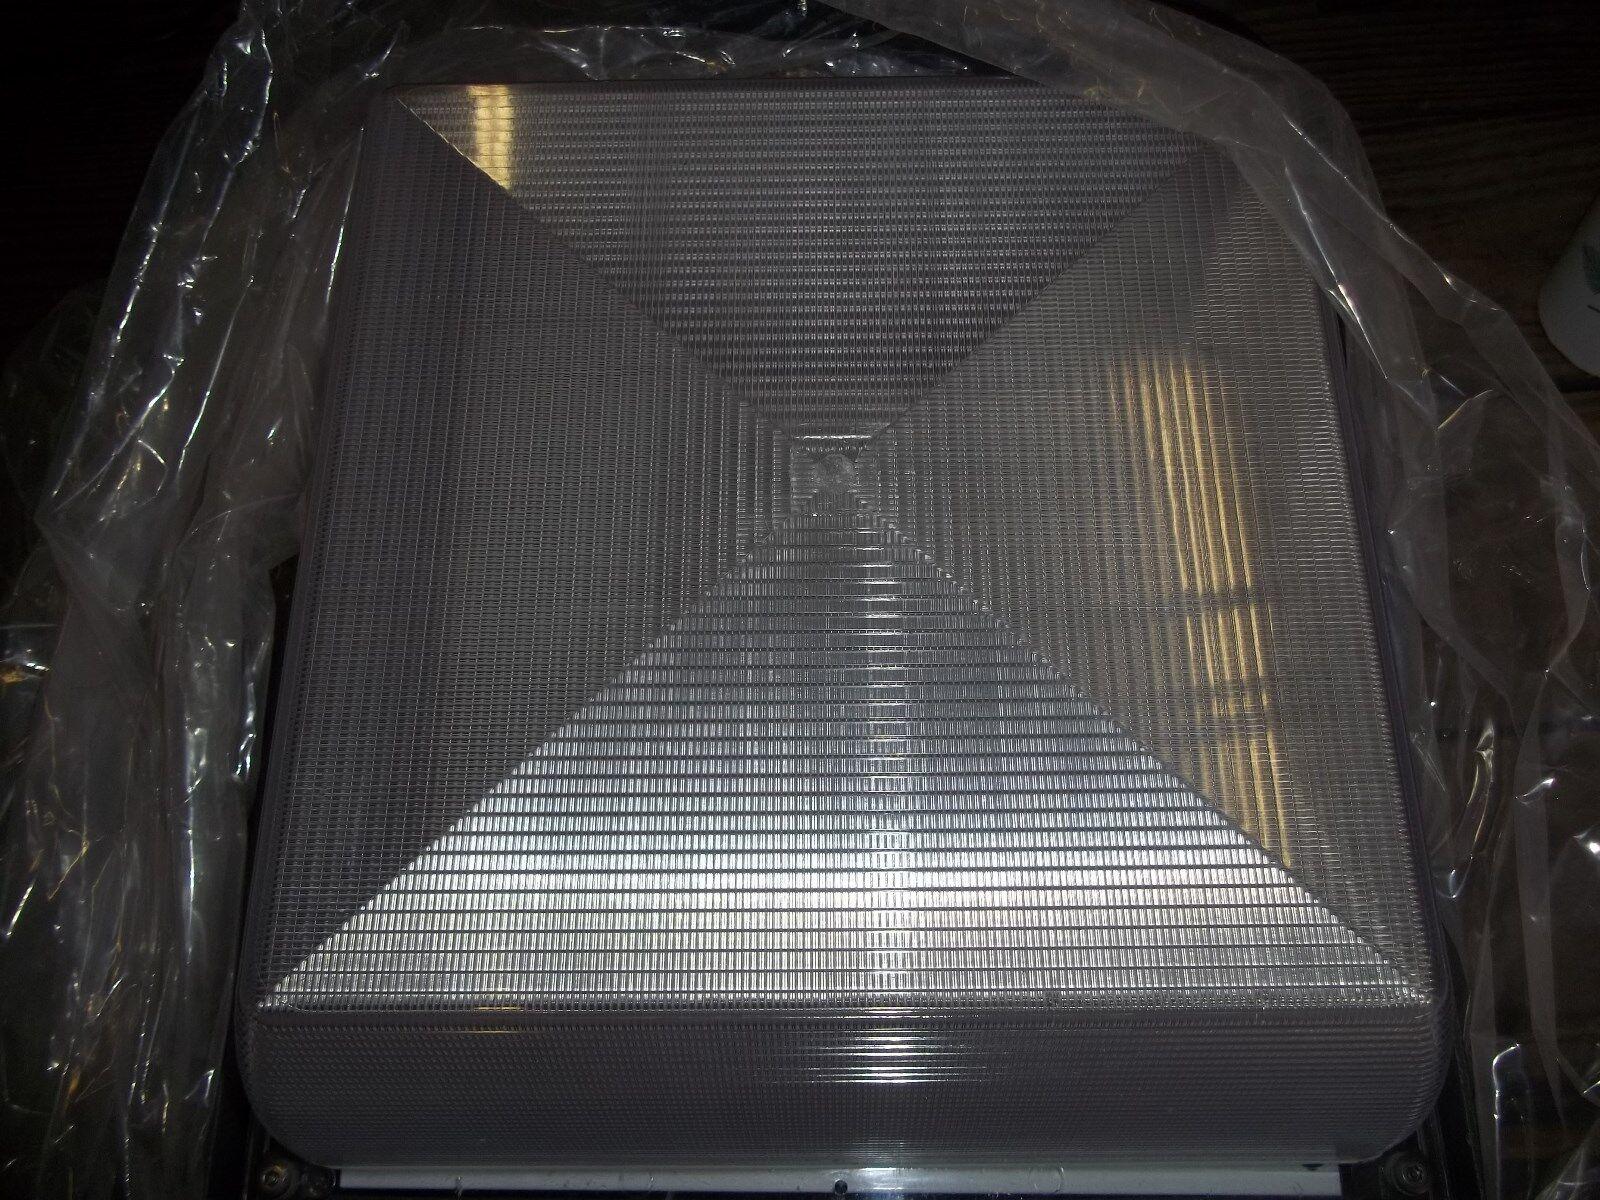 Cooper Lighting Fail Safe HUD/931093 & Building Materials u0026 Supplies  Construction  Business u0026 Industrial azcodes.com